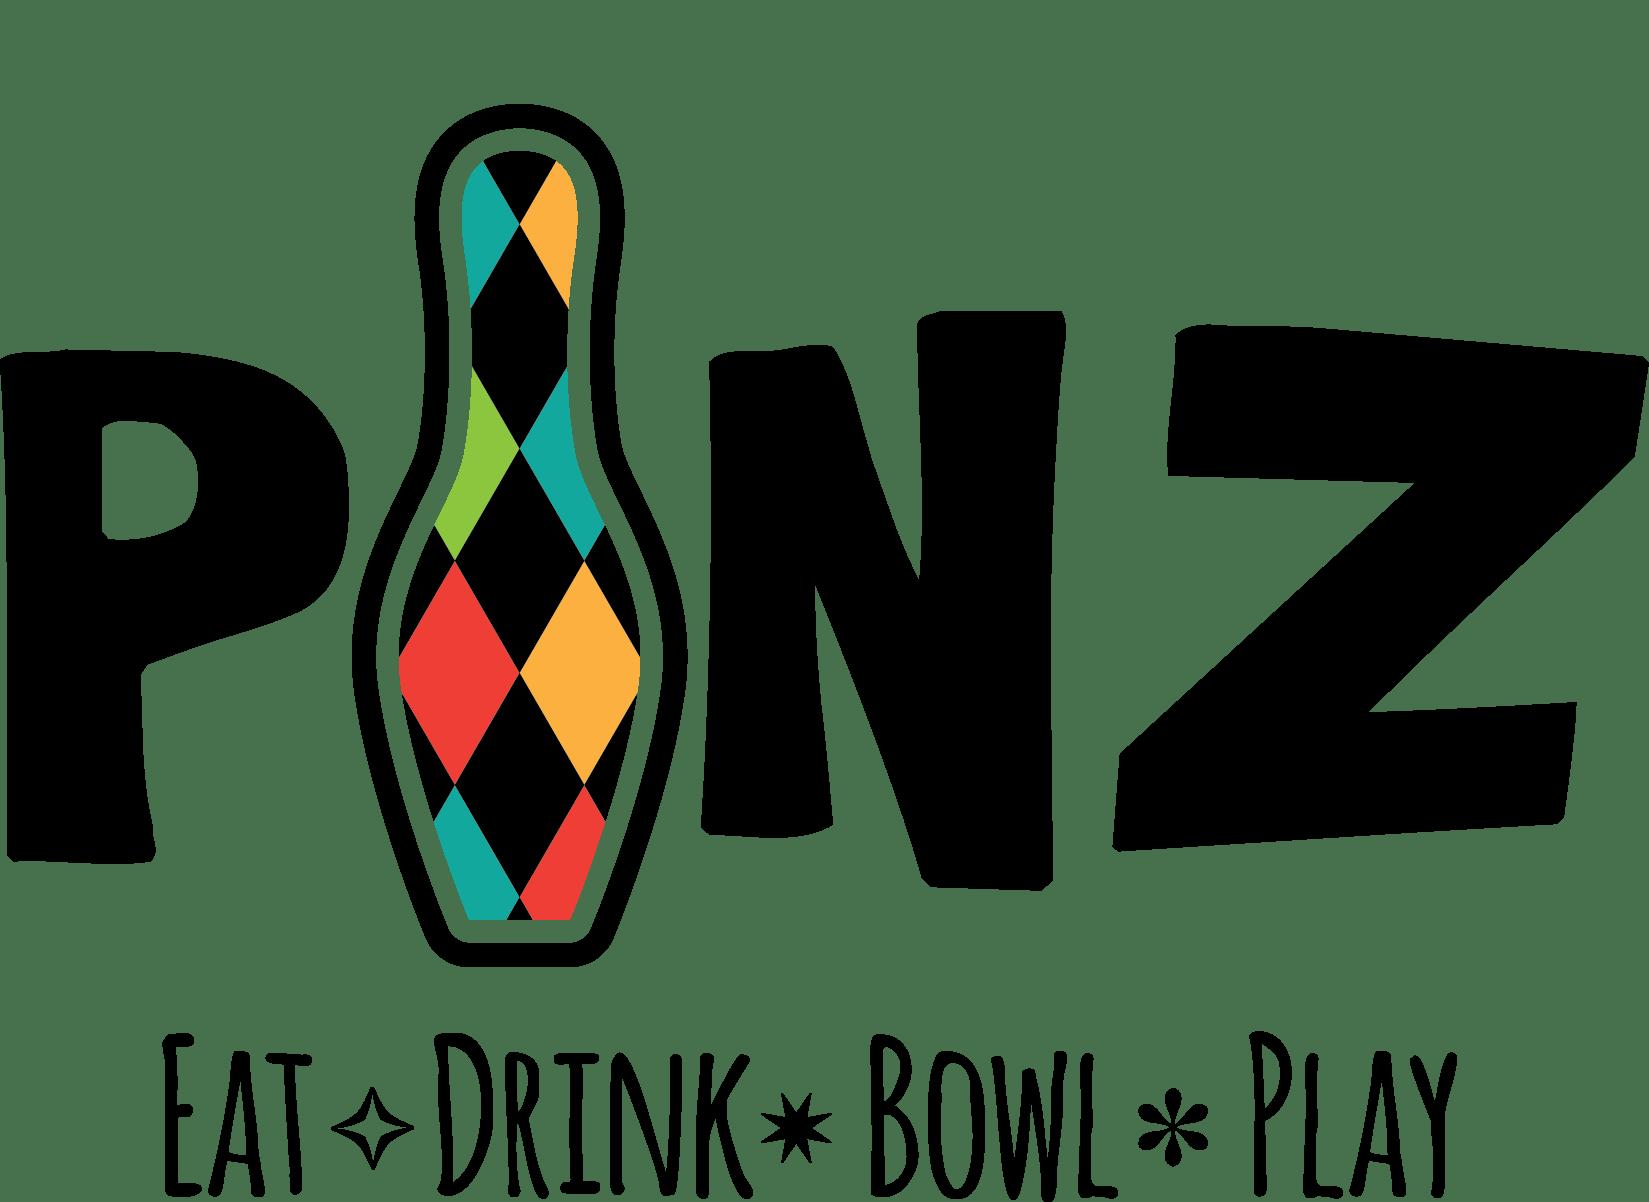 DRINK | PINZ